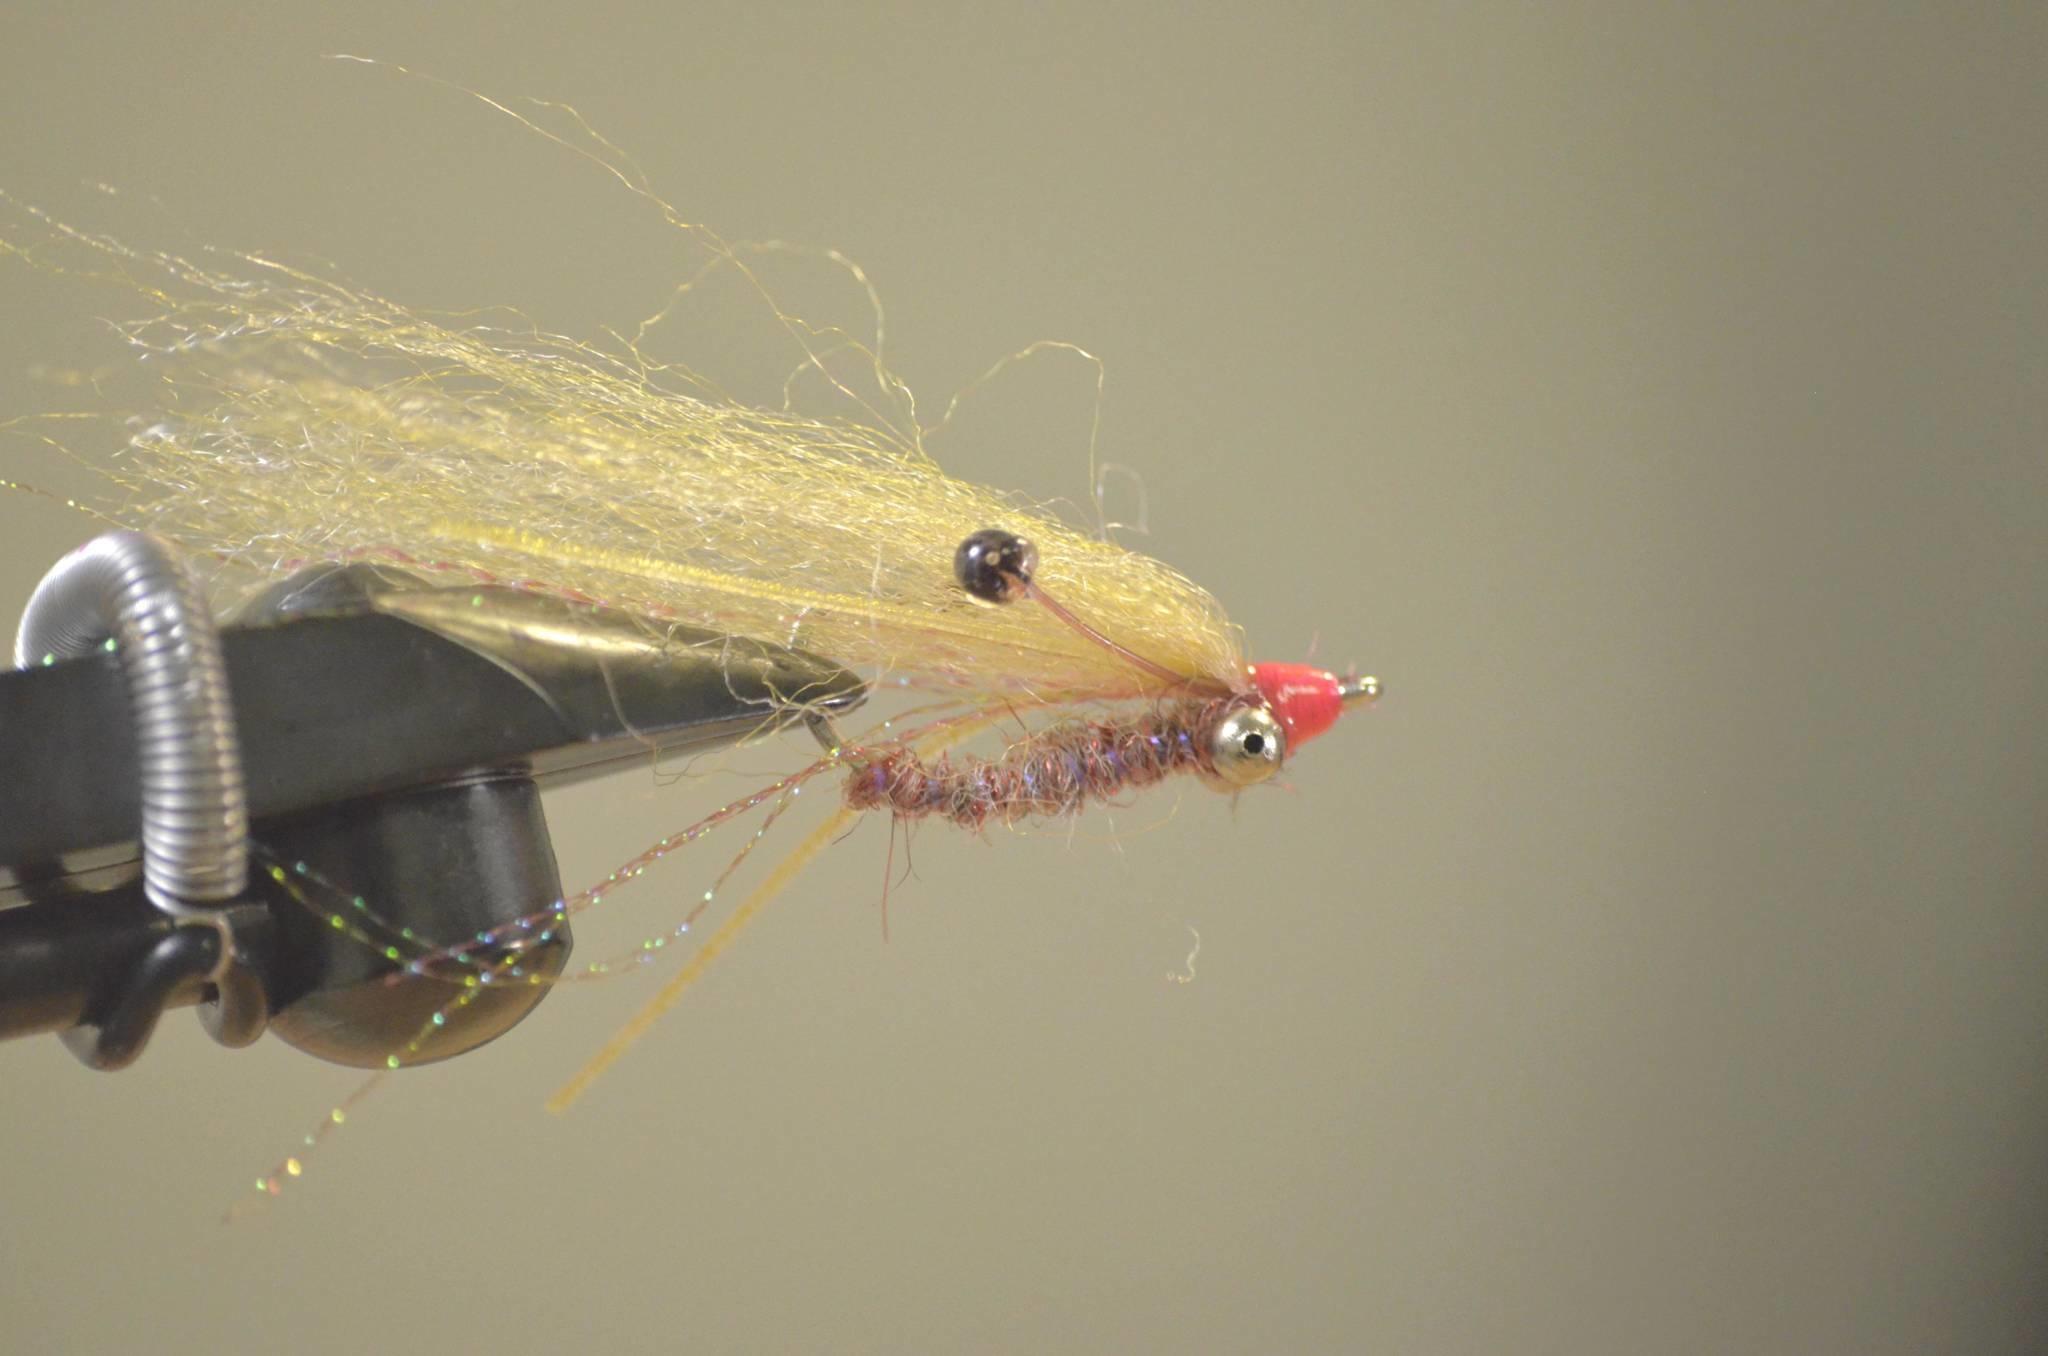 Urban Angler Fly Tying Kit - EP Red Sparkle Ghost Shrimp